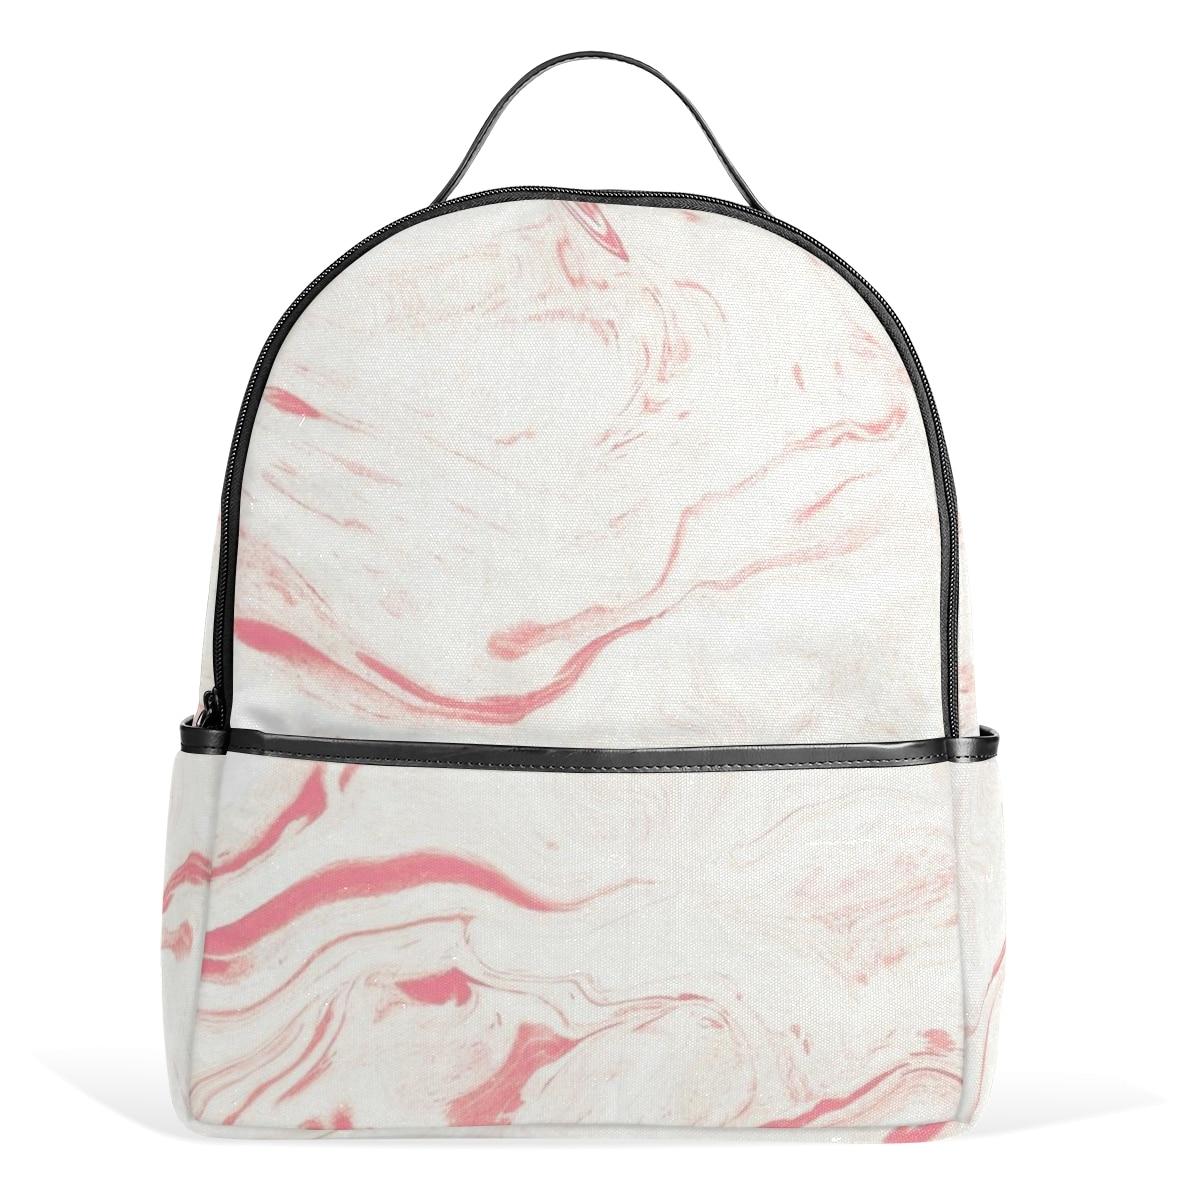 2017 Women Oil Canvas Shoulder Bag Leisure Backpack Waterproof Computer Bags Canvas Bag Free Shipping free shipping 2014 boom bag leisure contracted one shoulder bag chain canvas bag